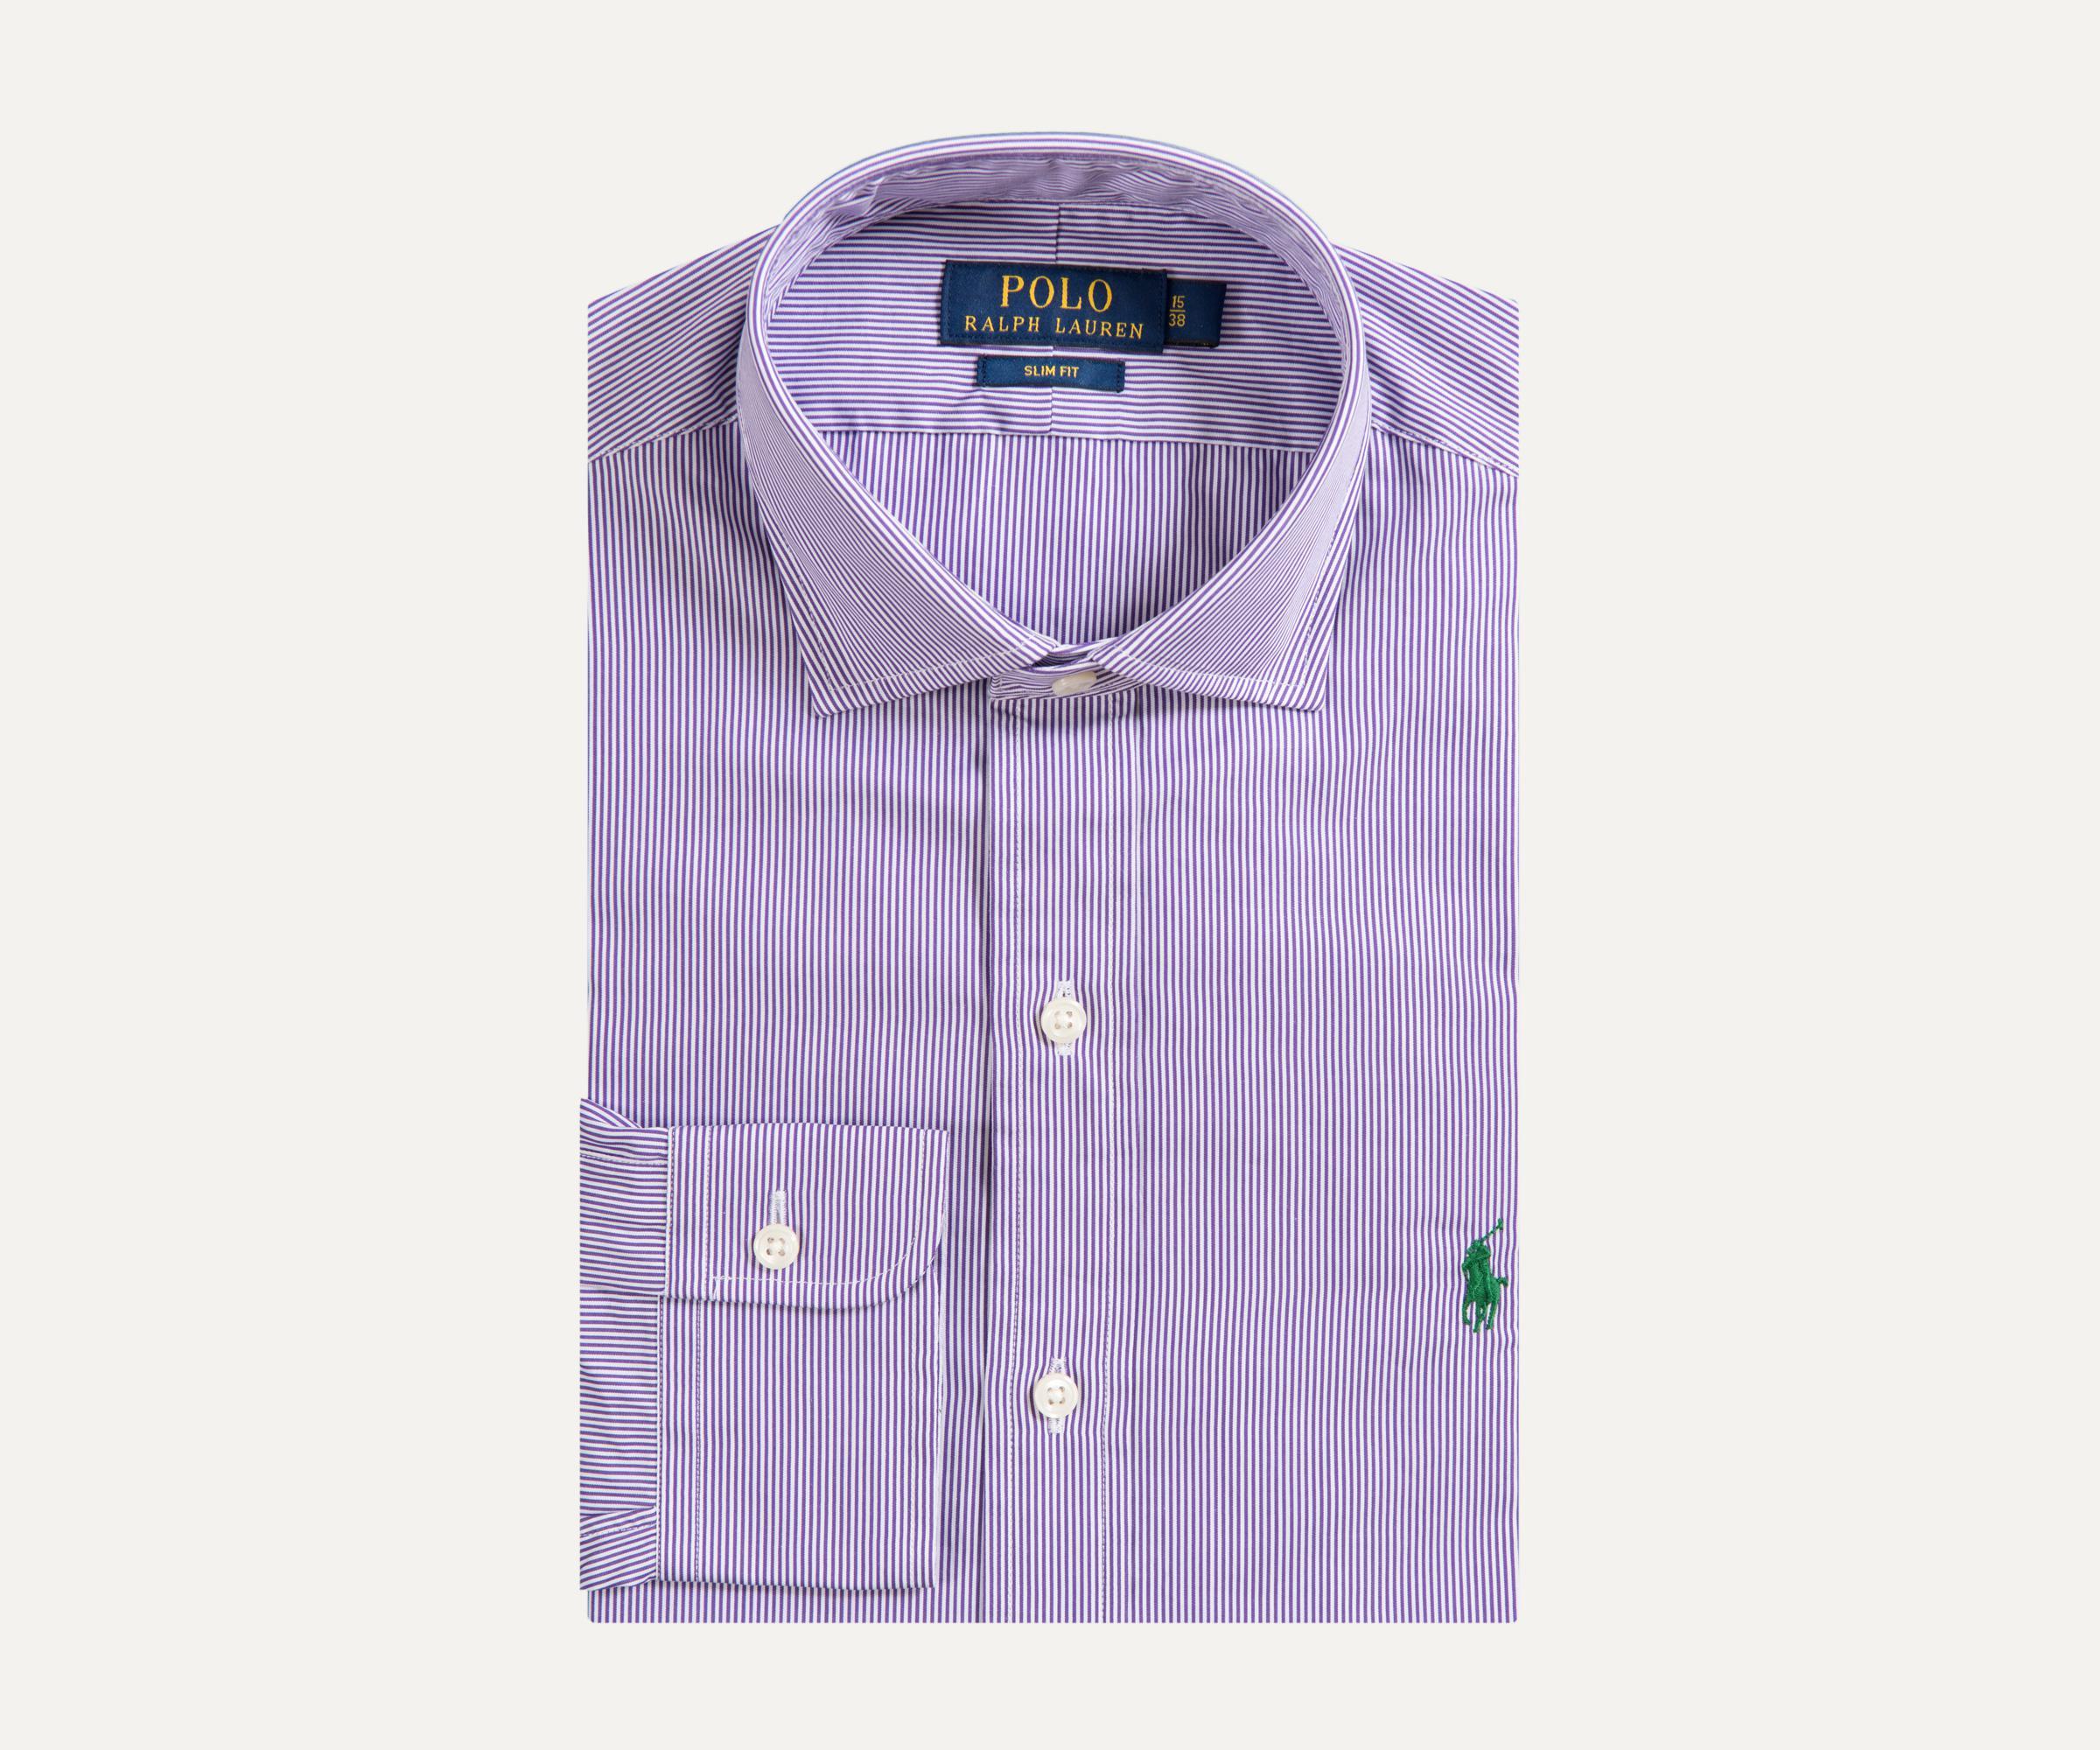 ralph lauren tailored fit shirt polo city shirts